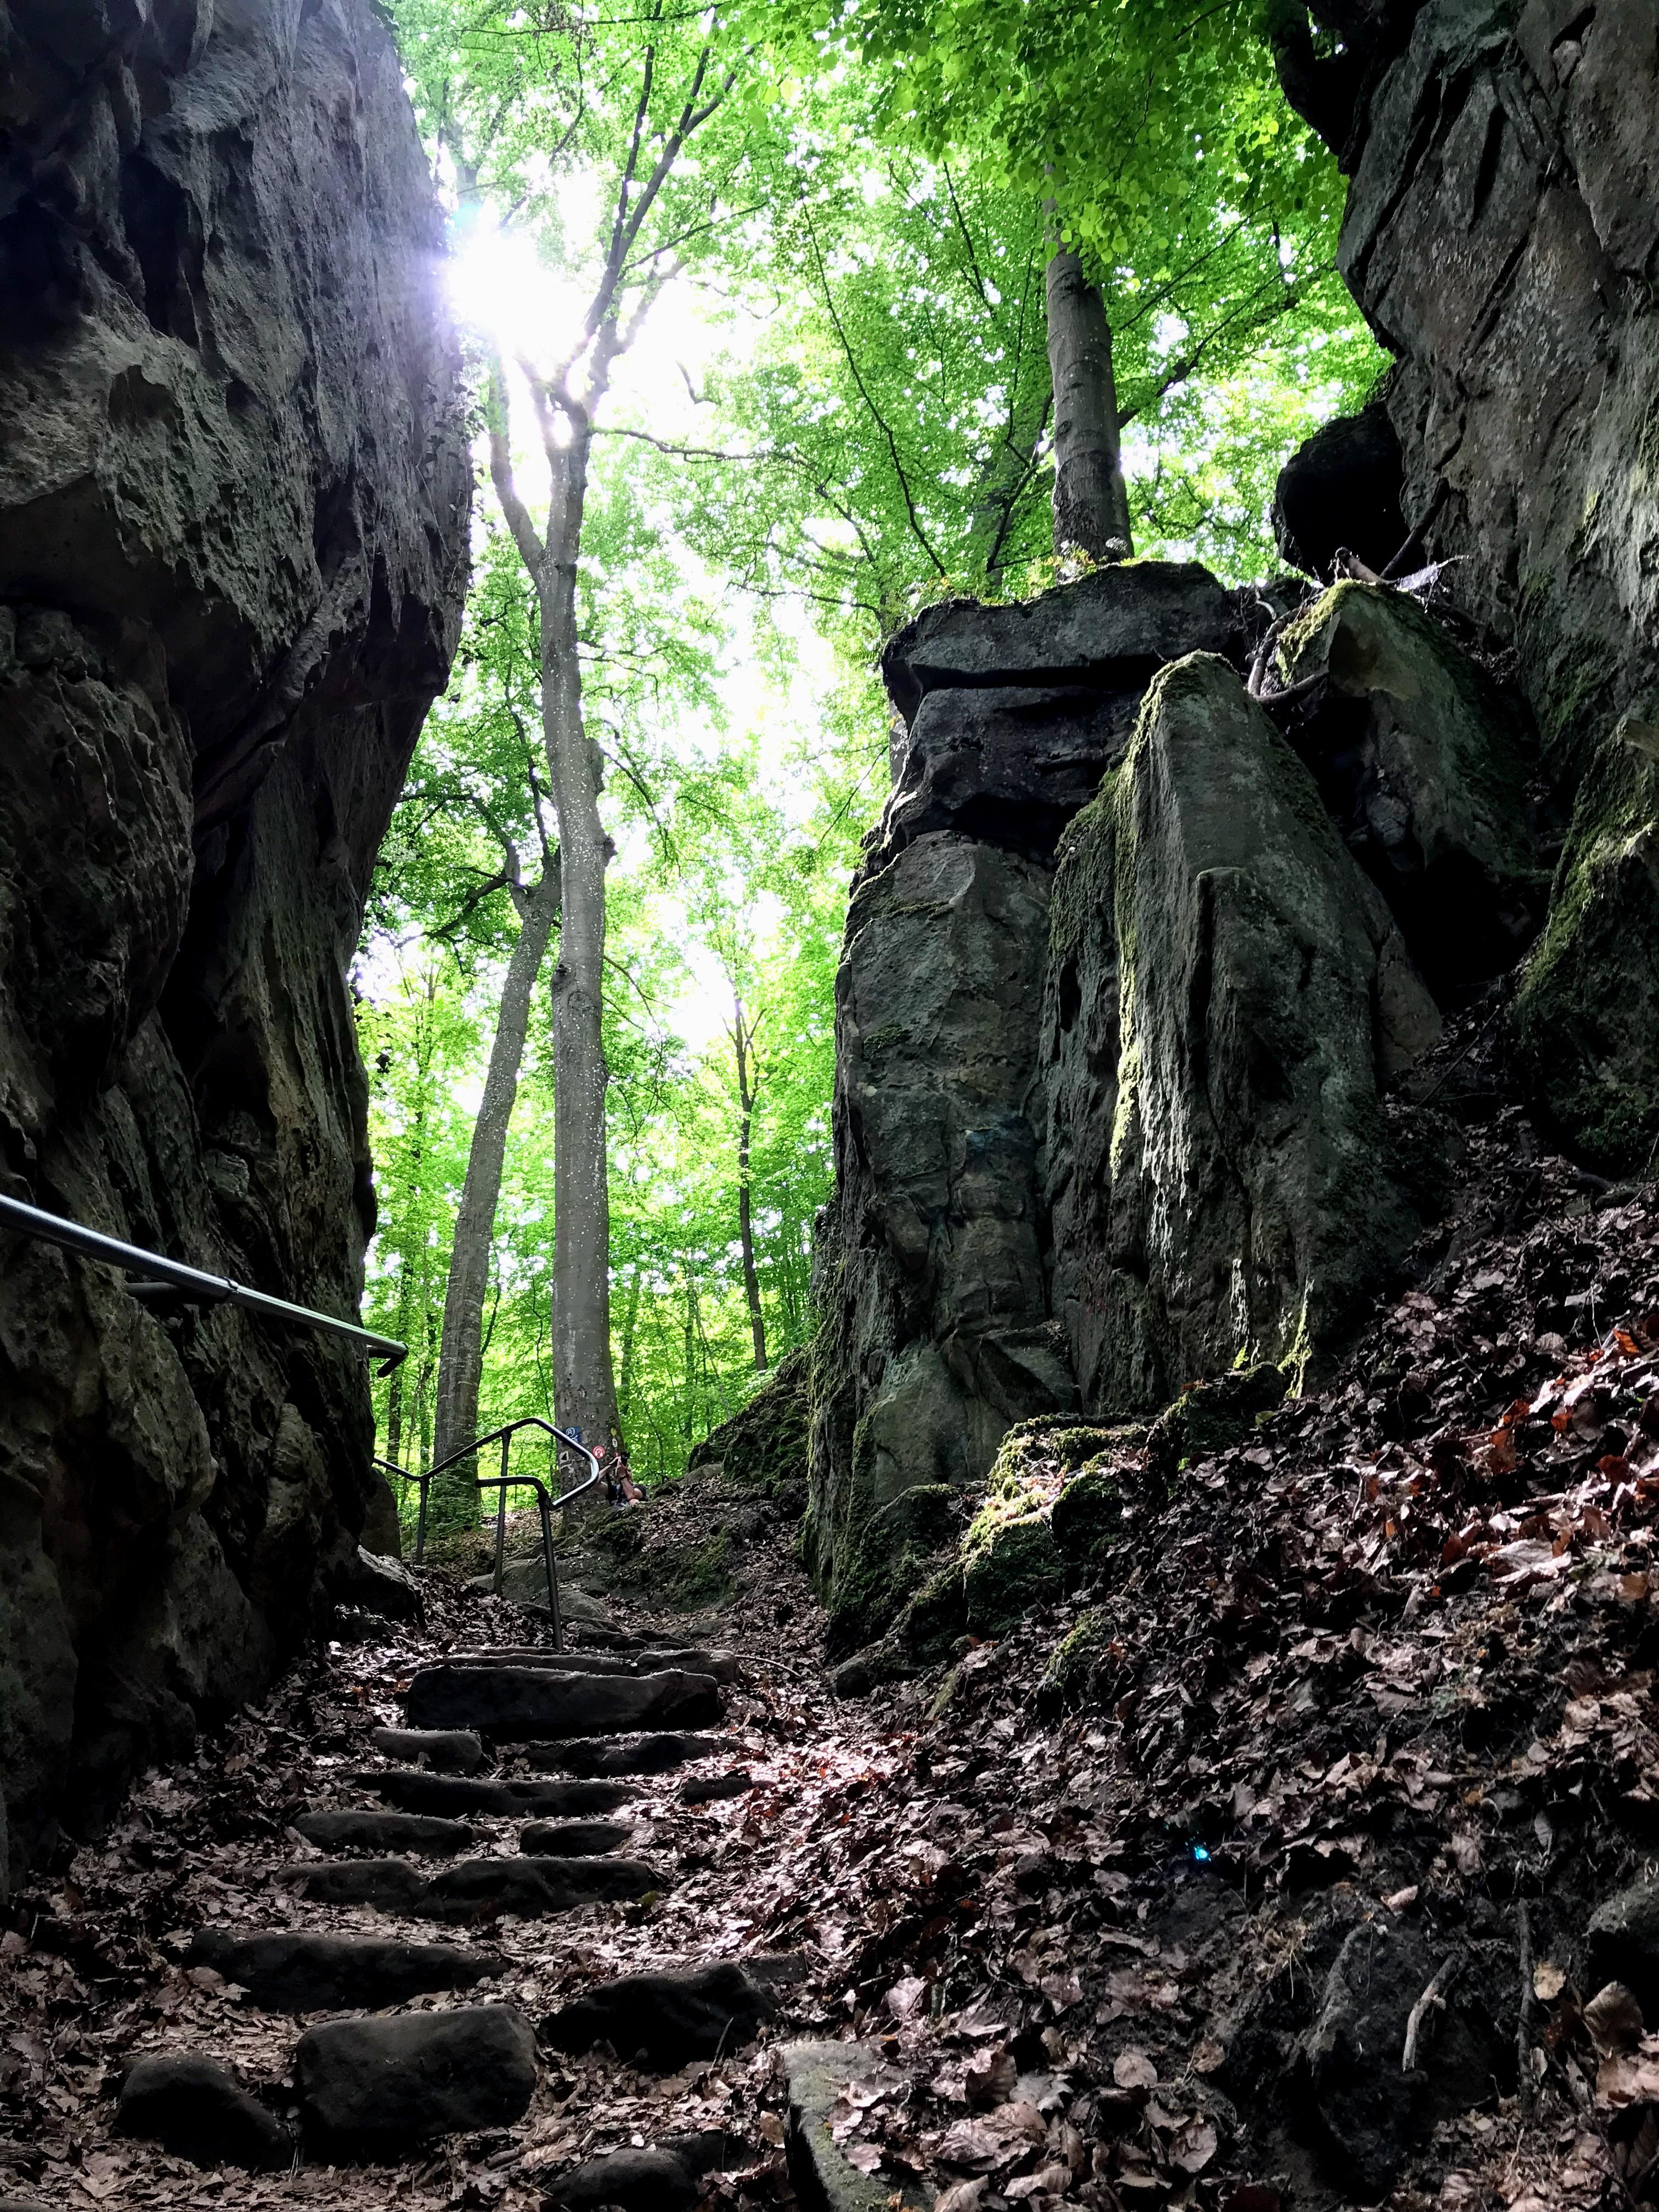 De Teufelsschlucht in de Eifel